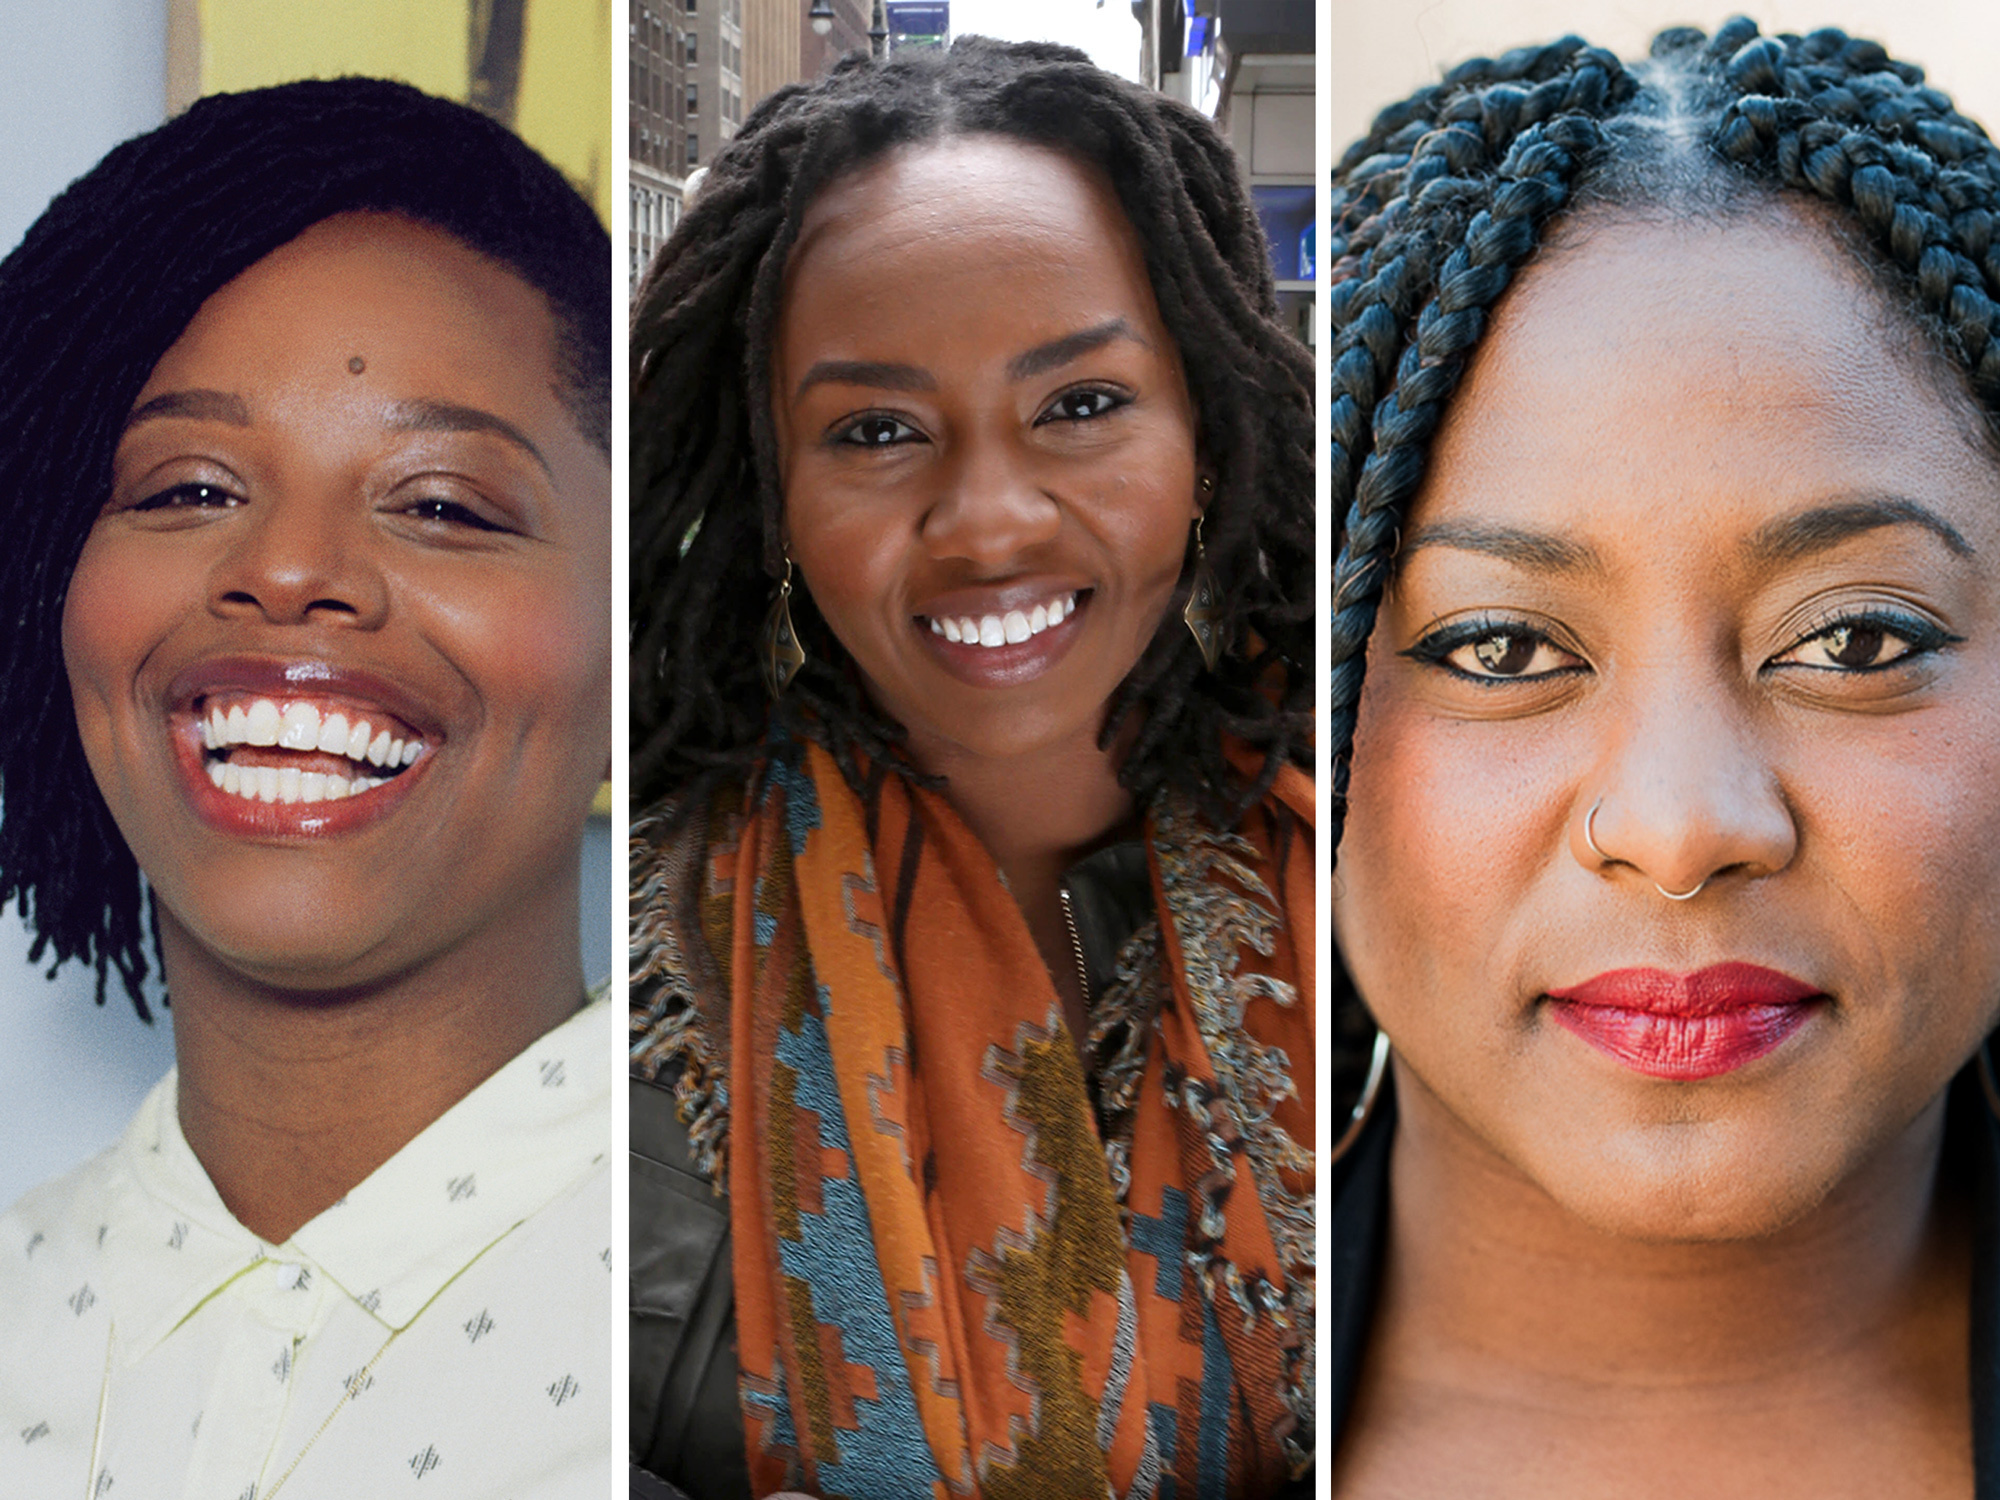 black lives matter founders describe paradigm shift in